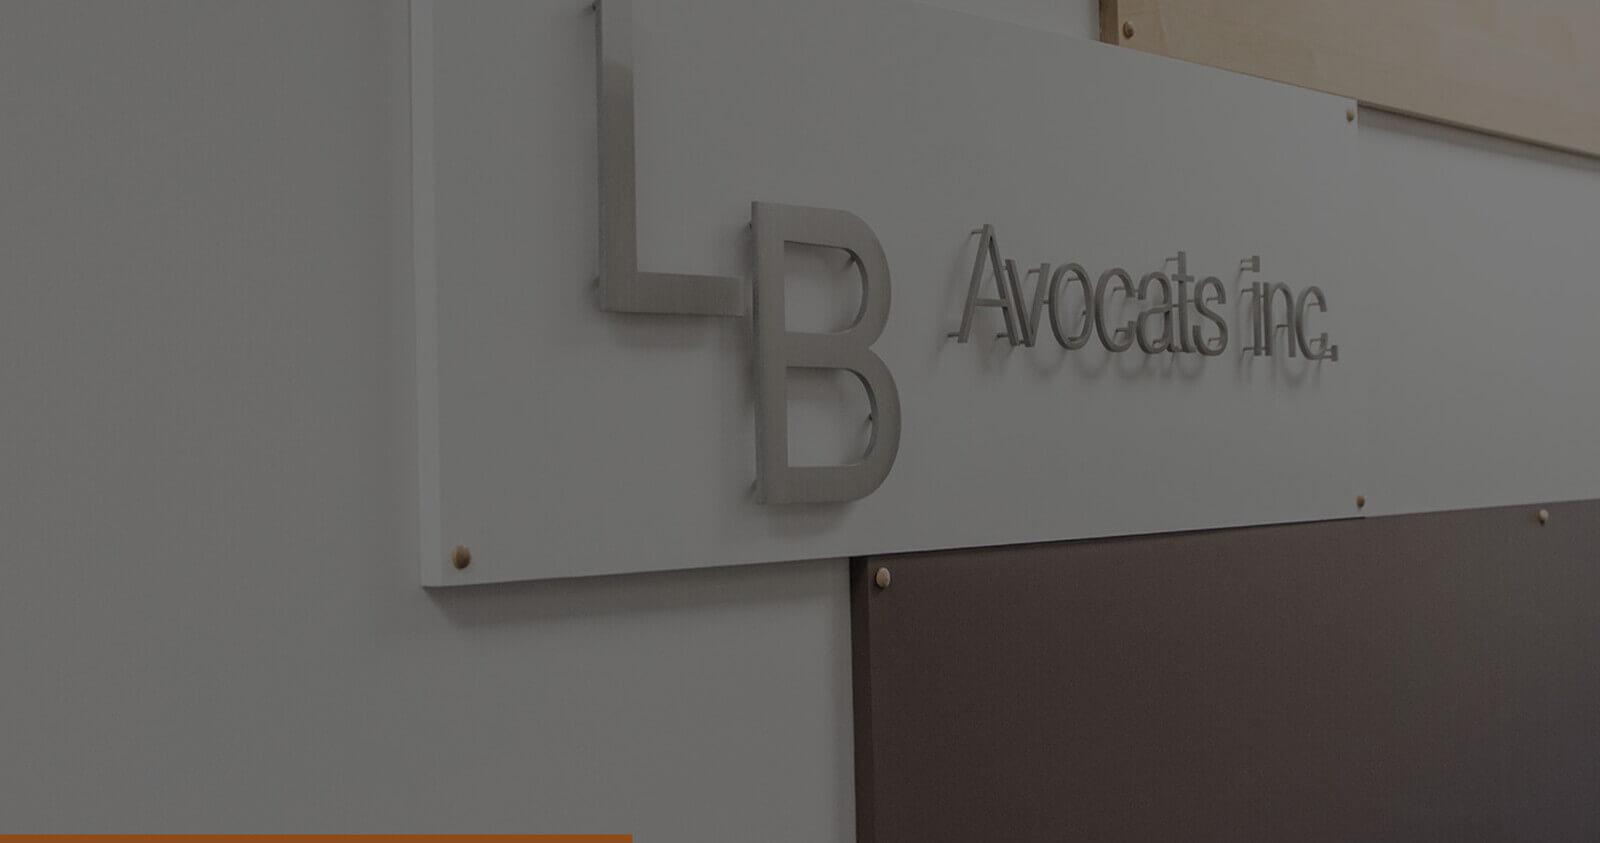 Cabinet davocats Avocats LB Avocats Cowansville prs de Granby